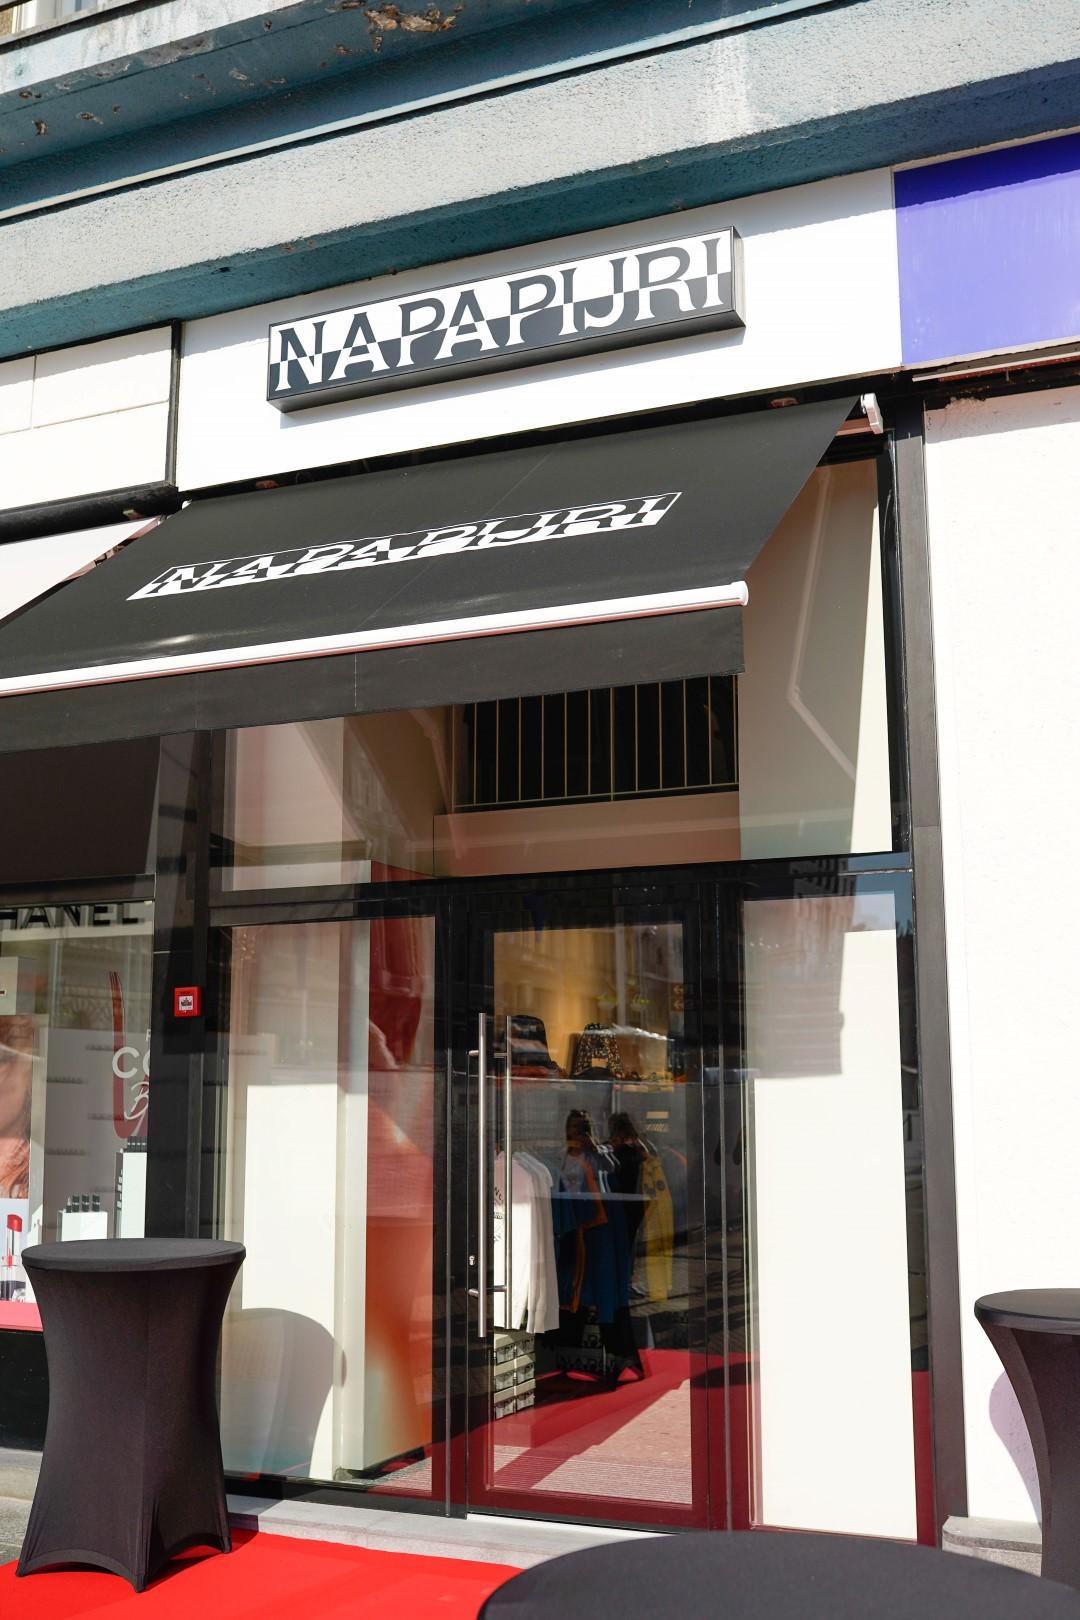 Centar Zagreba bogatiji je za oazu sportske elegancije u najluksuznijem smislu - Napapijri store